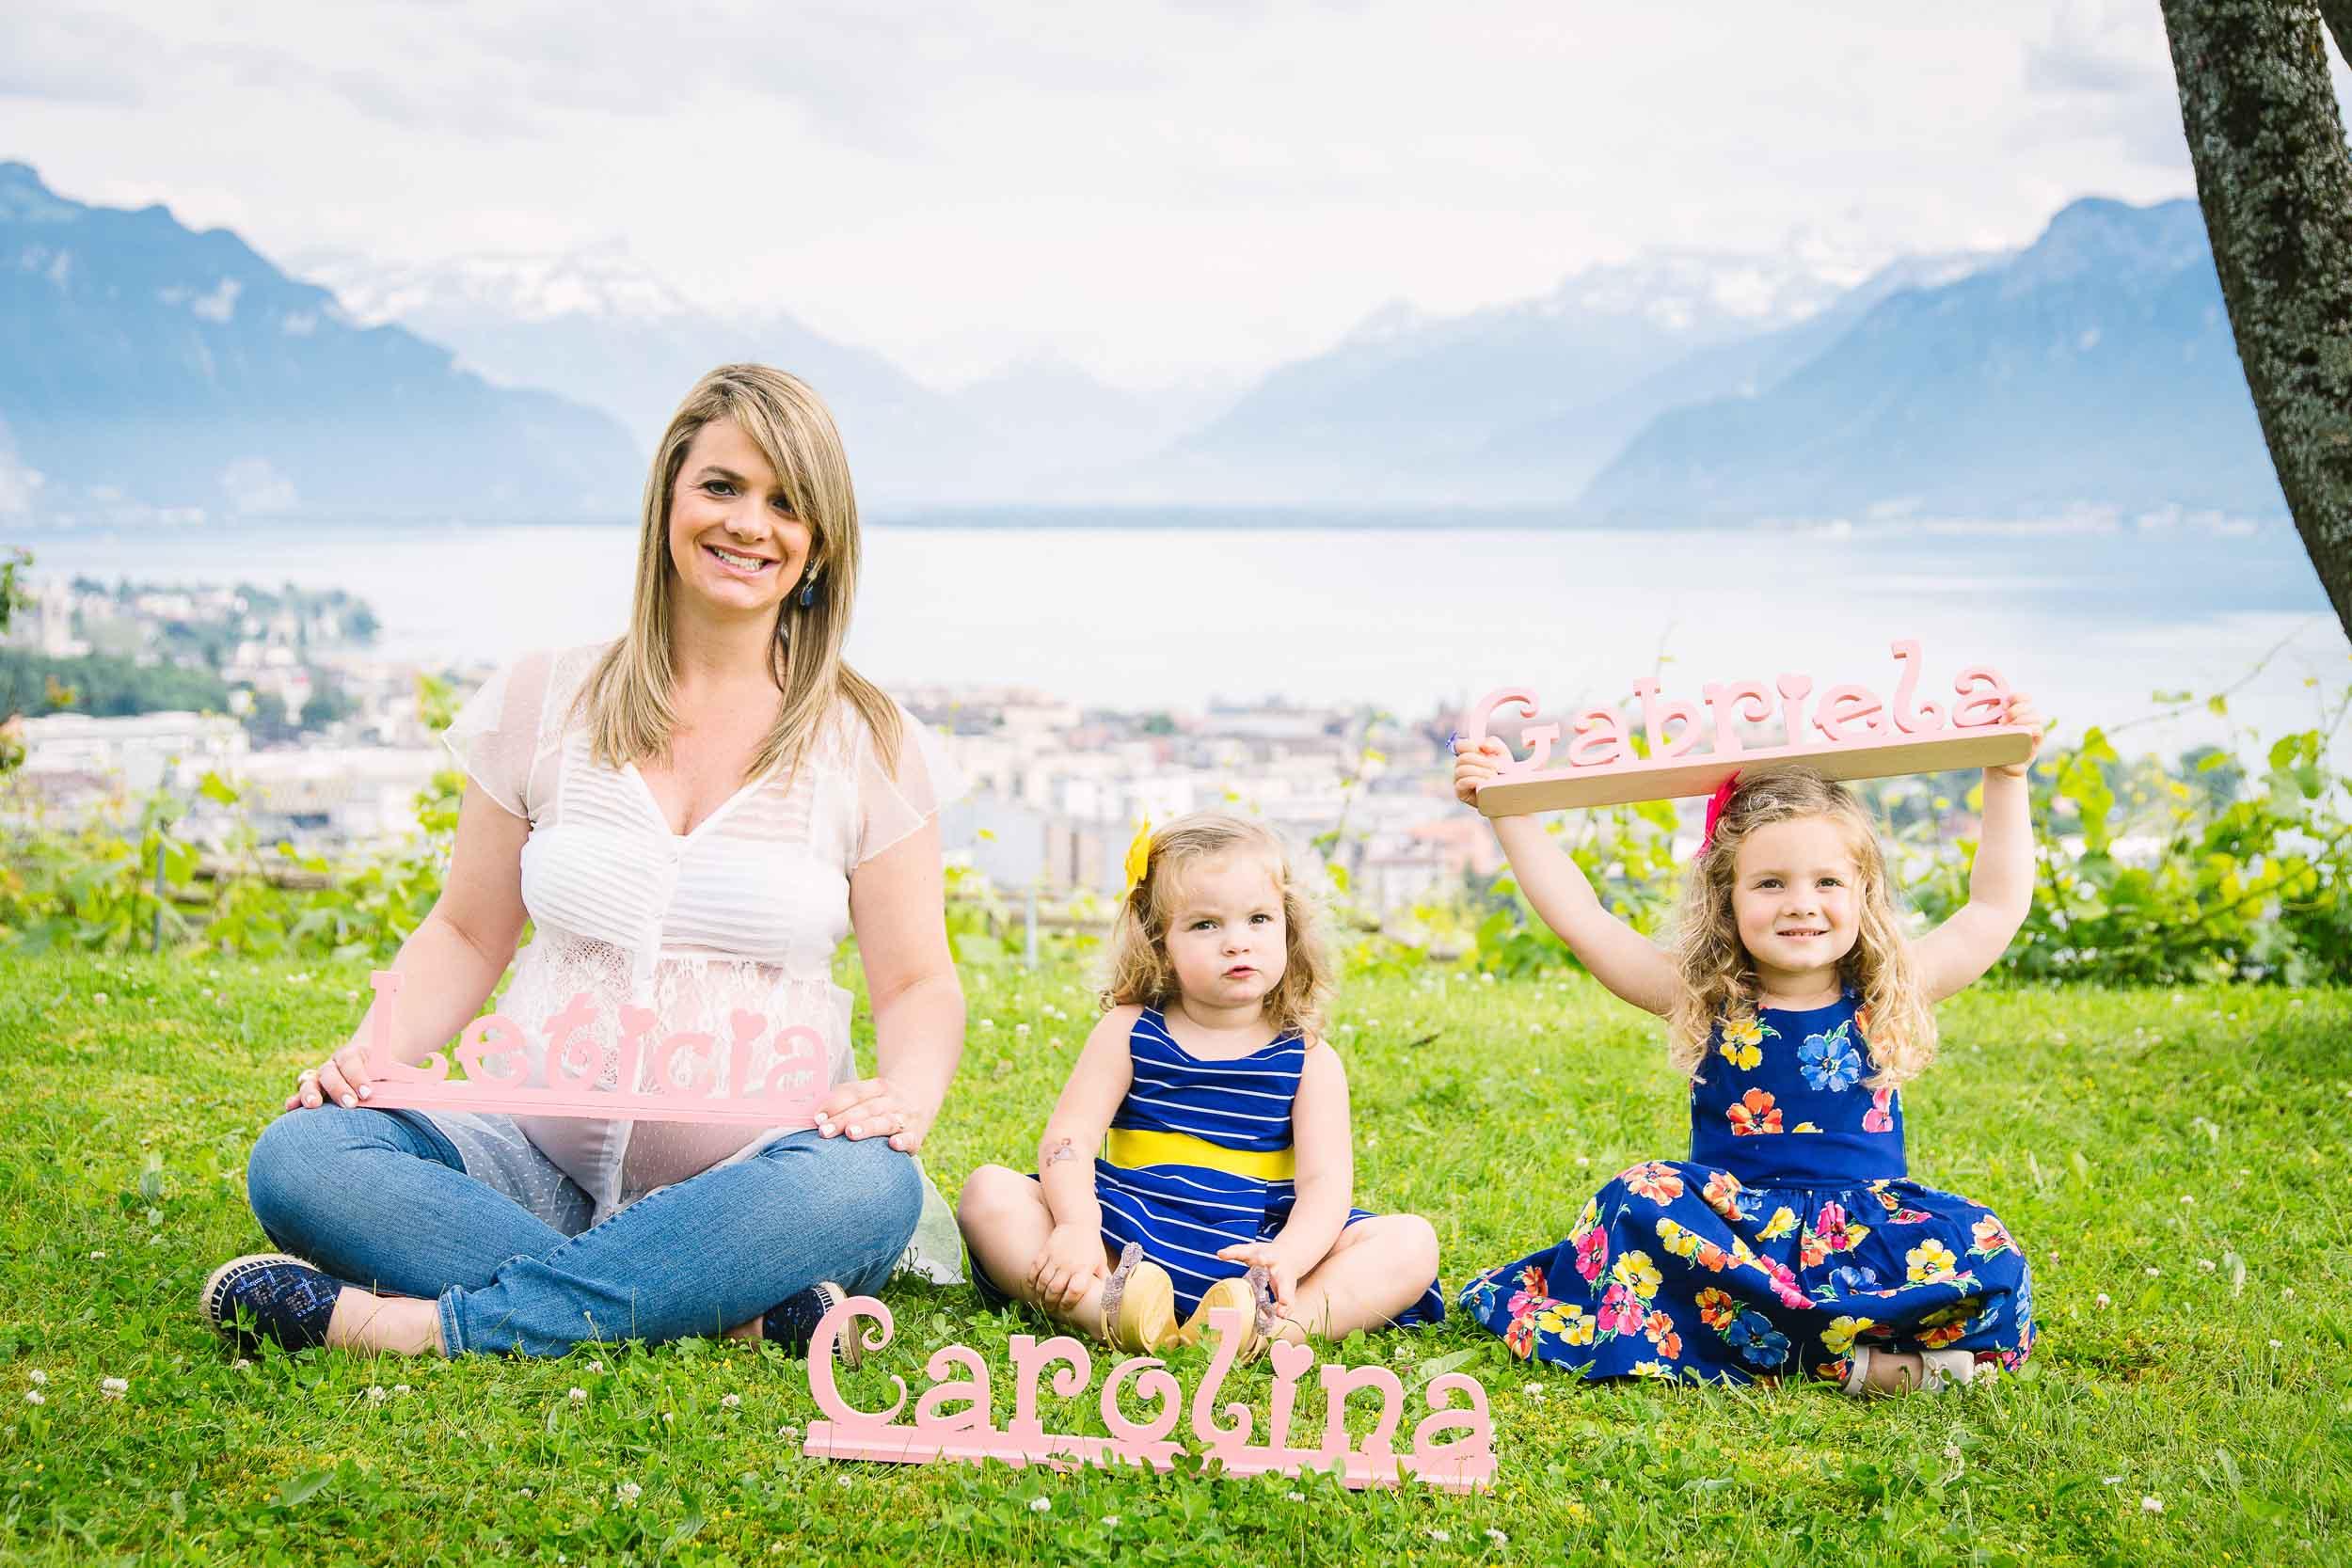 074-Caren-Maternity3-7935-col.jpg